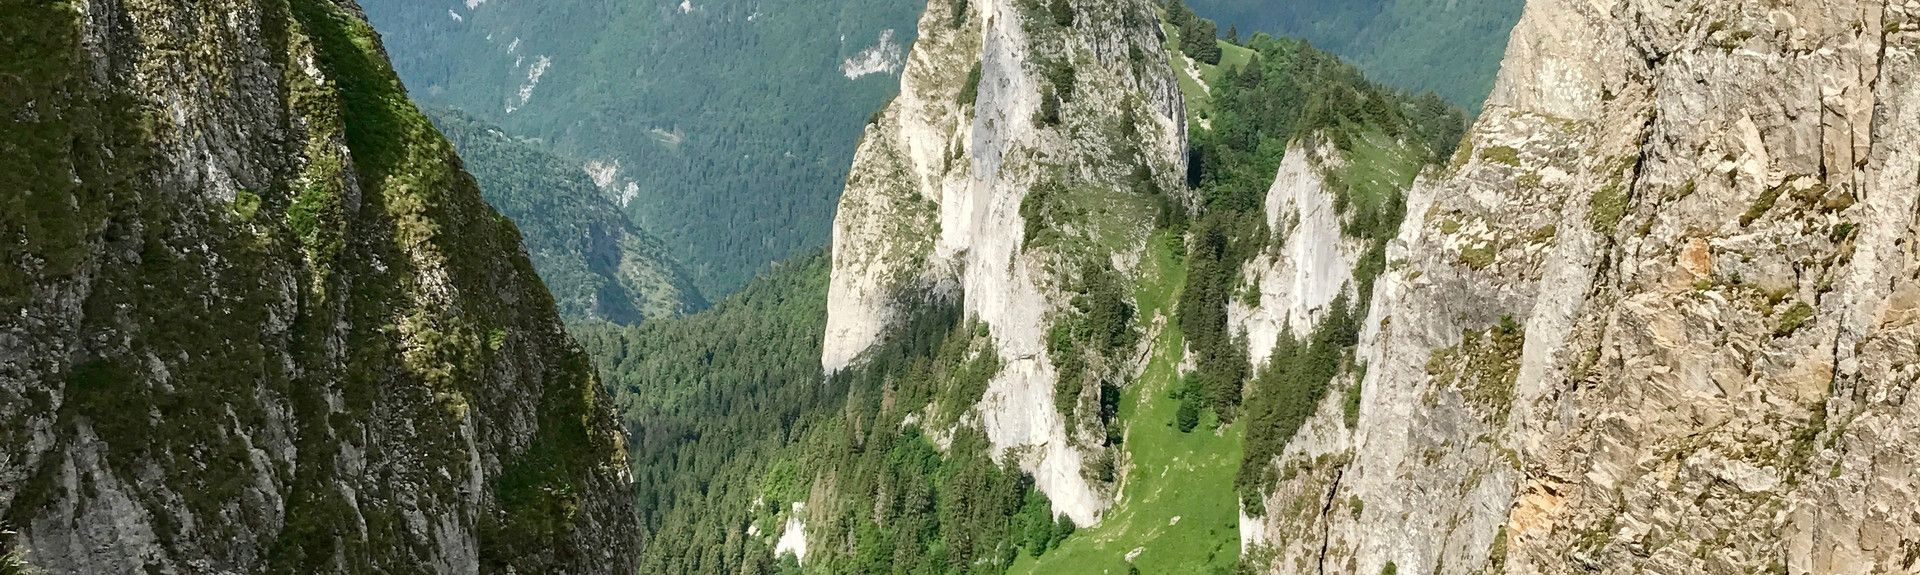 Messery, Auvergne-Rhône-Alpes, Frankrig